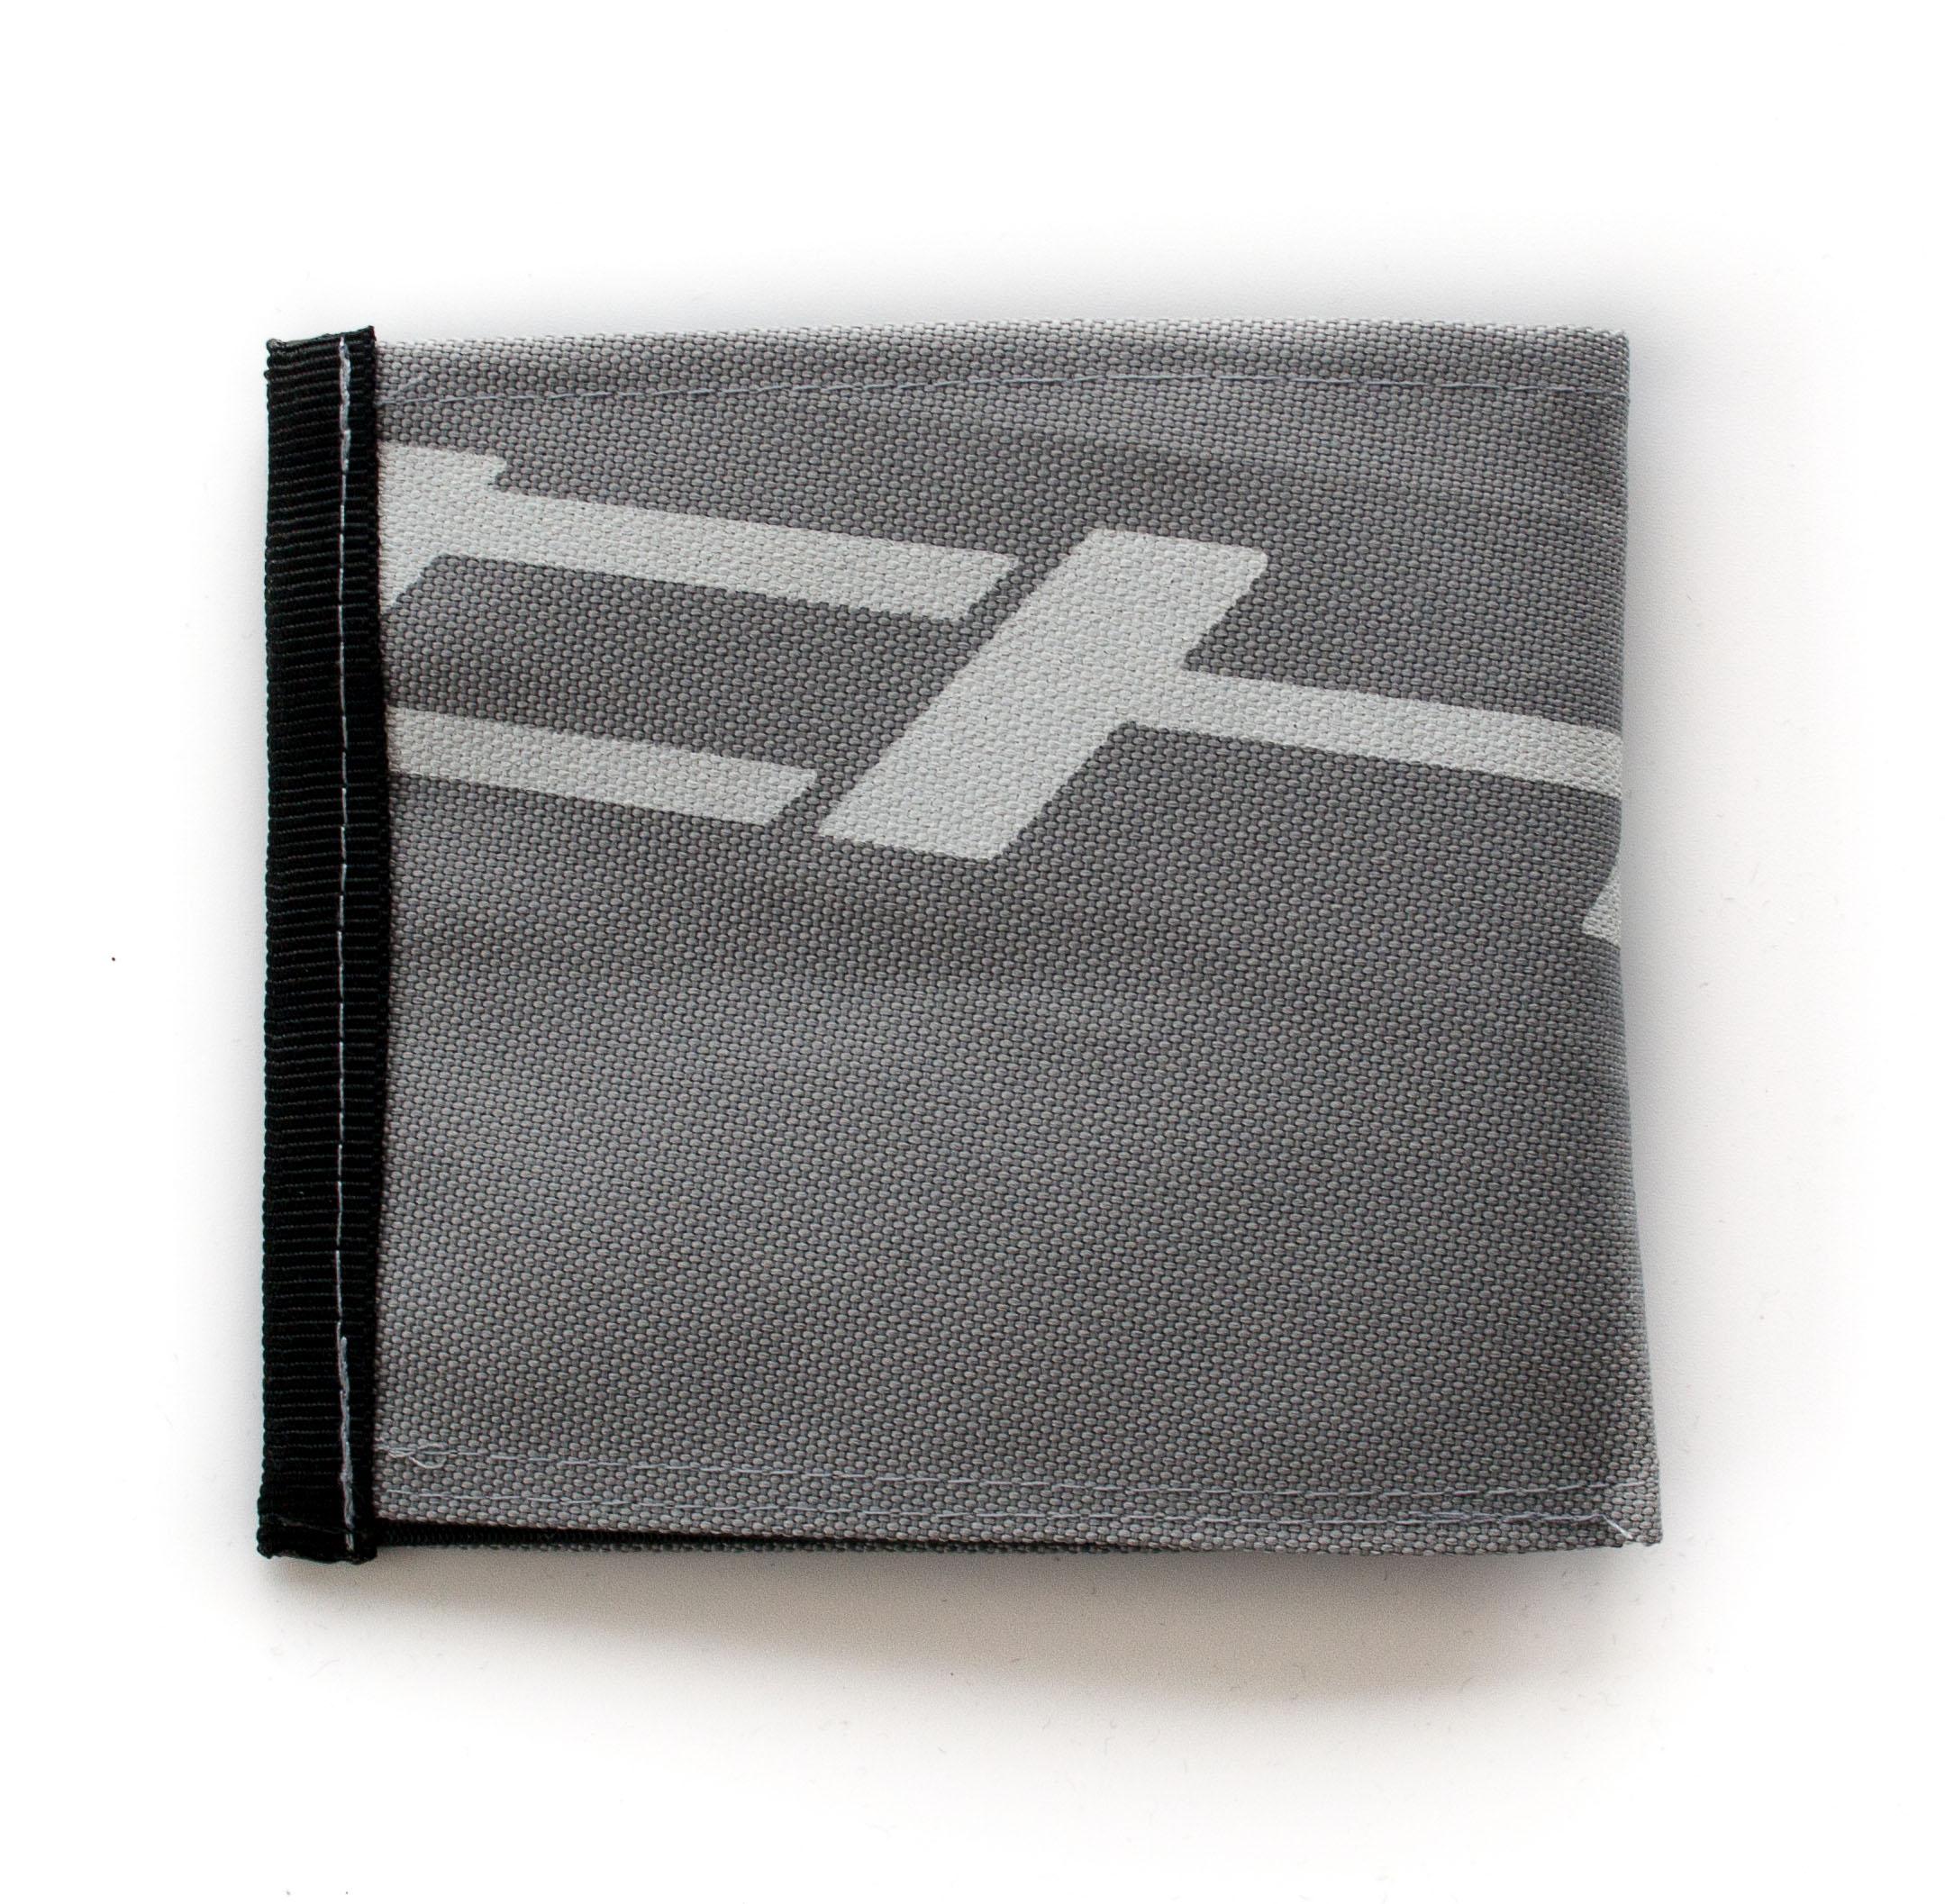 ReSailCle - Duke II wallet